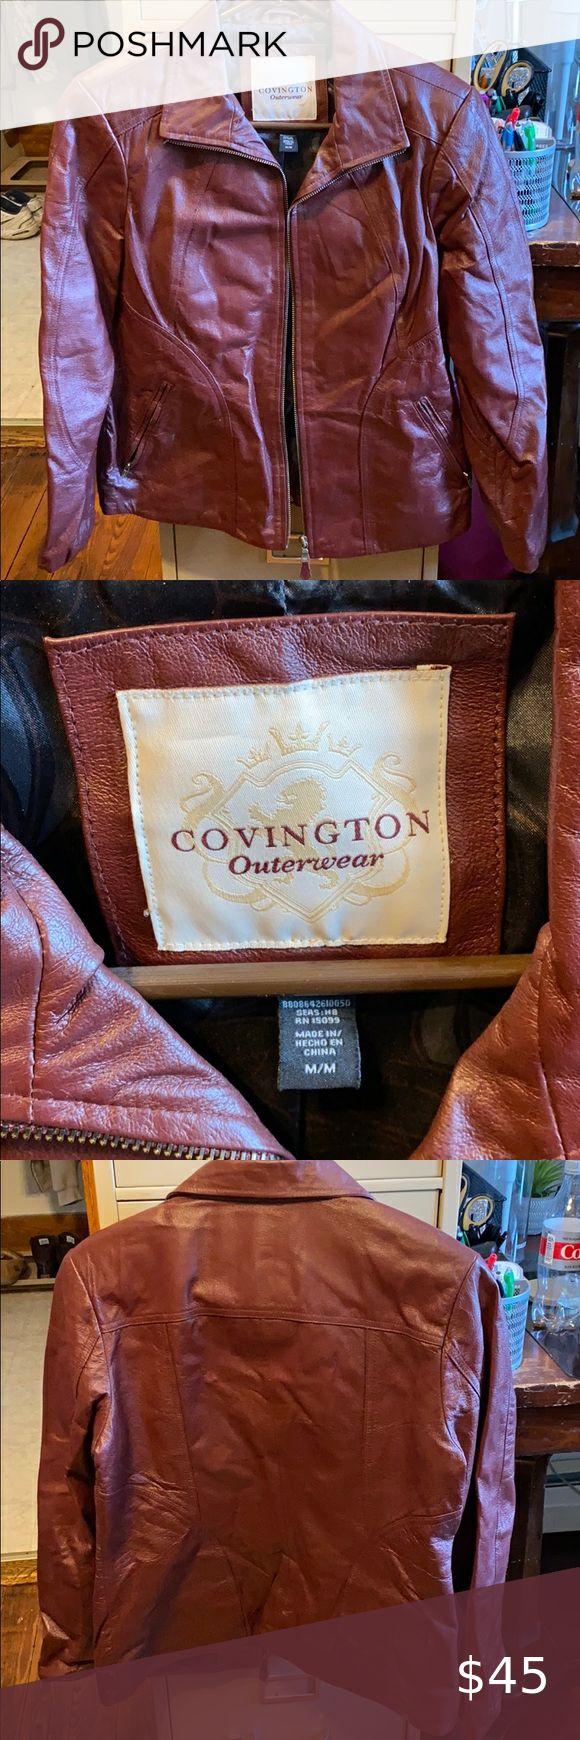 Covington Outerwear Leather Jacket Leather Jacket Jackets Outerwear [ 1740 x 580 Pixel ]